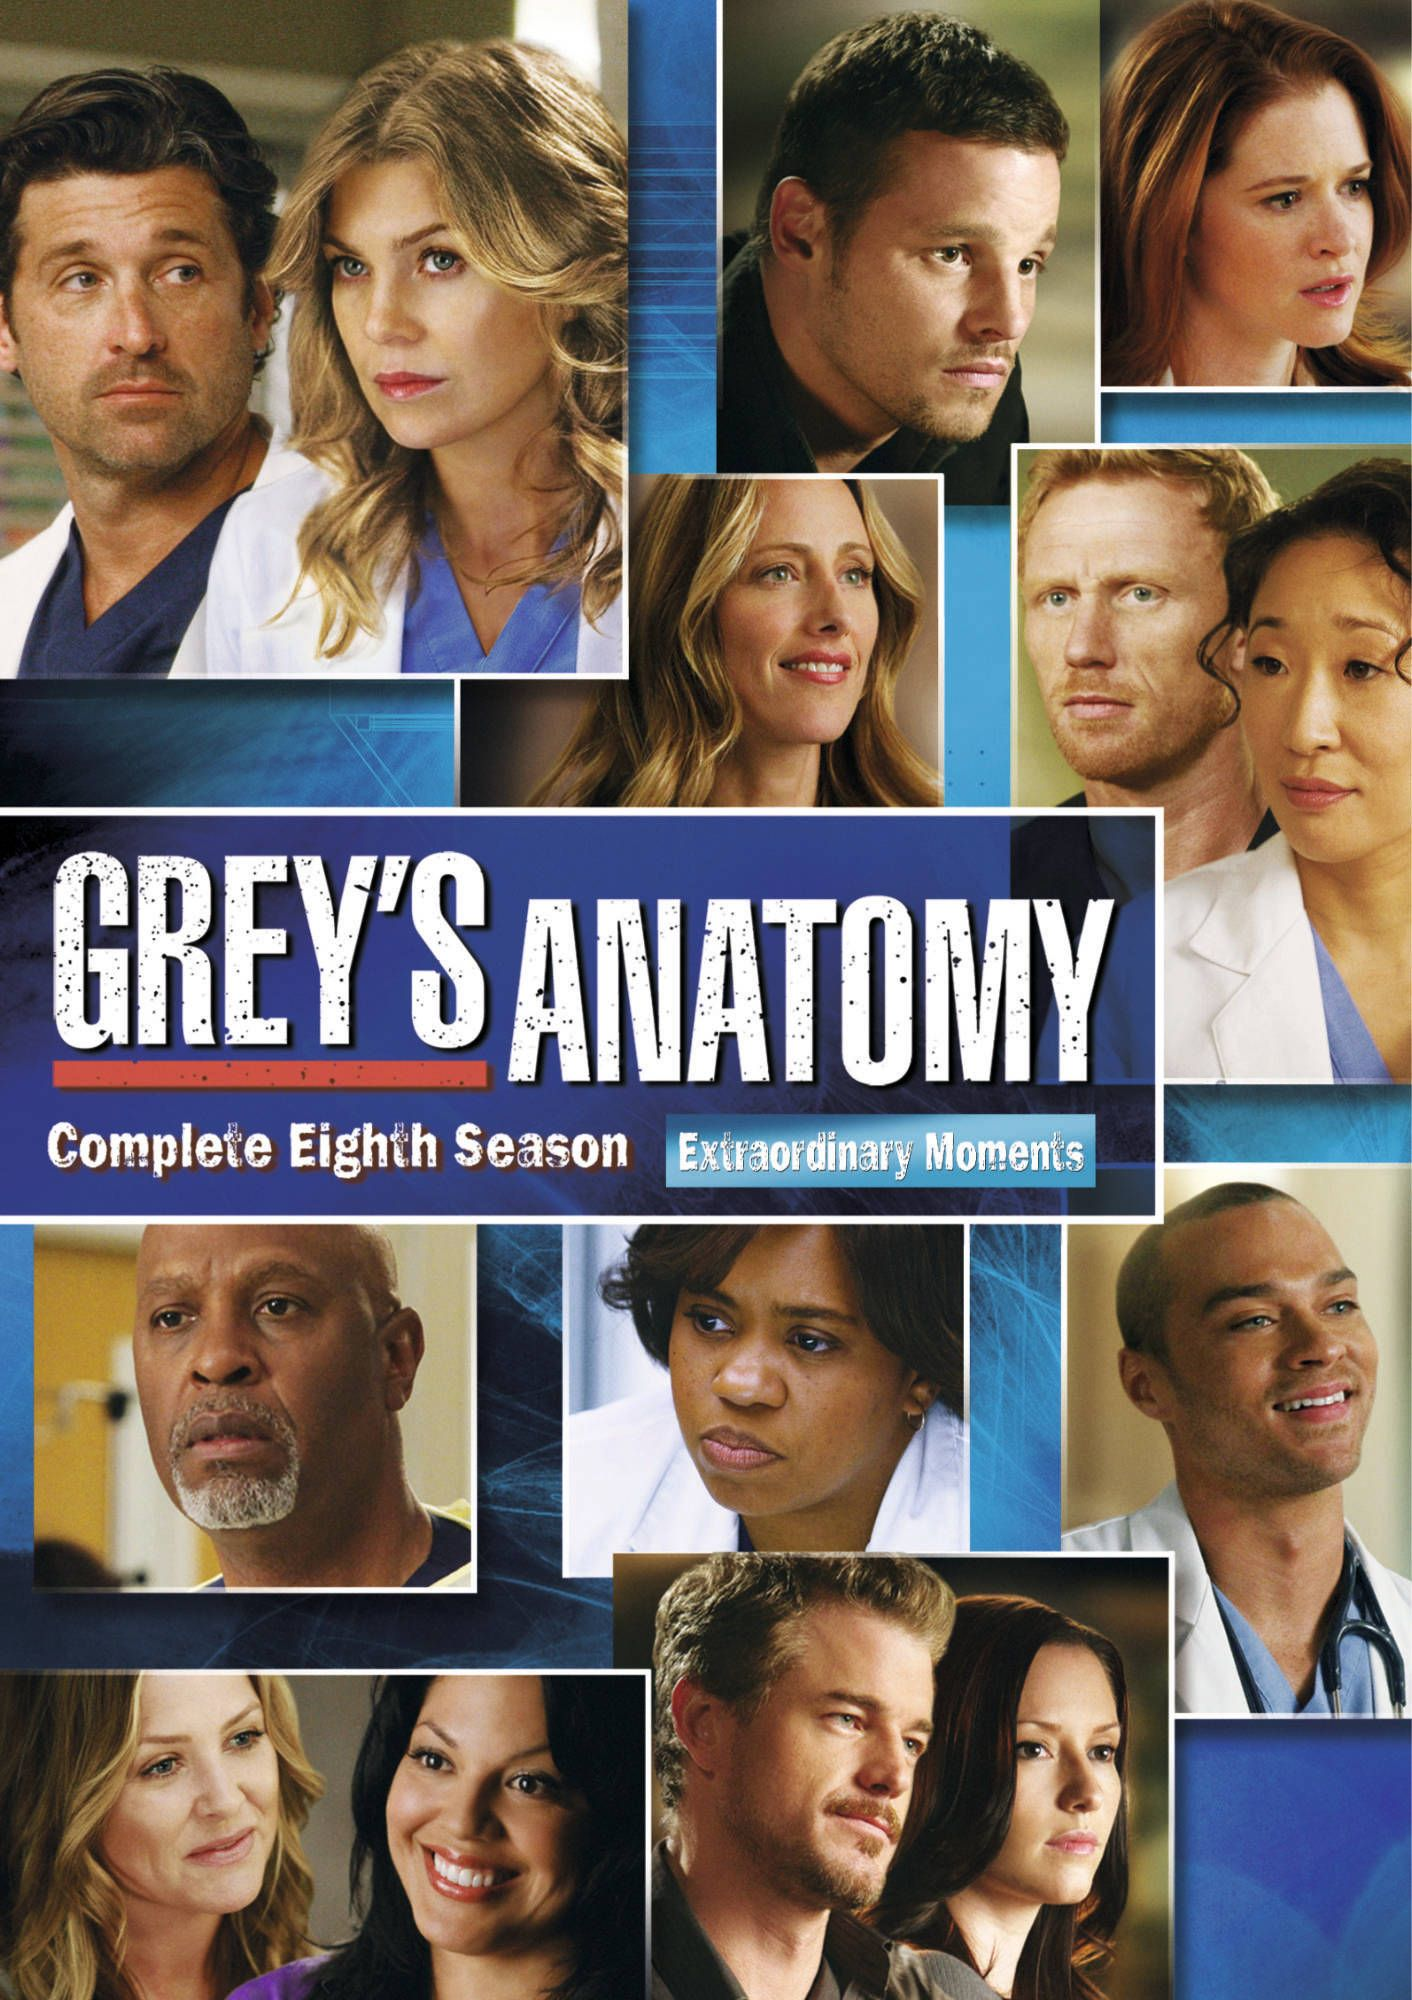 Greys Anatomy 2012 2013 Greys Anatomy 8 Gen Dvd Greys Anatomy